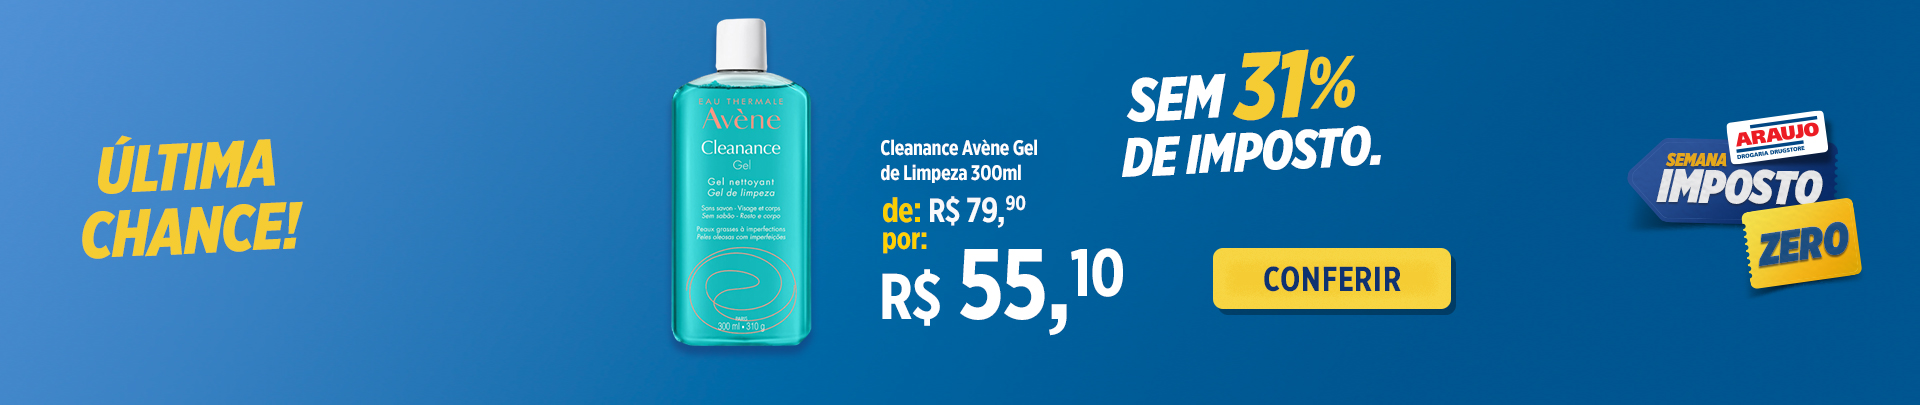 Cleanance_Dli